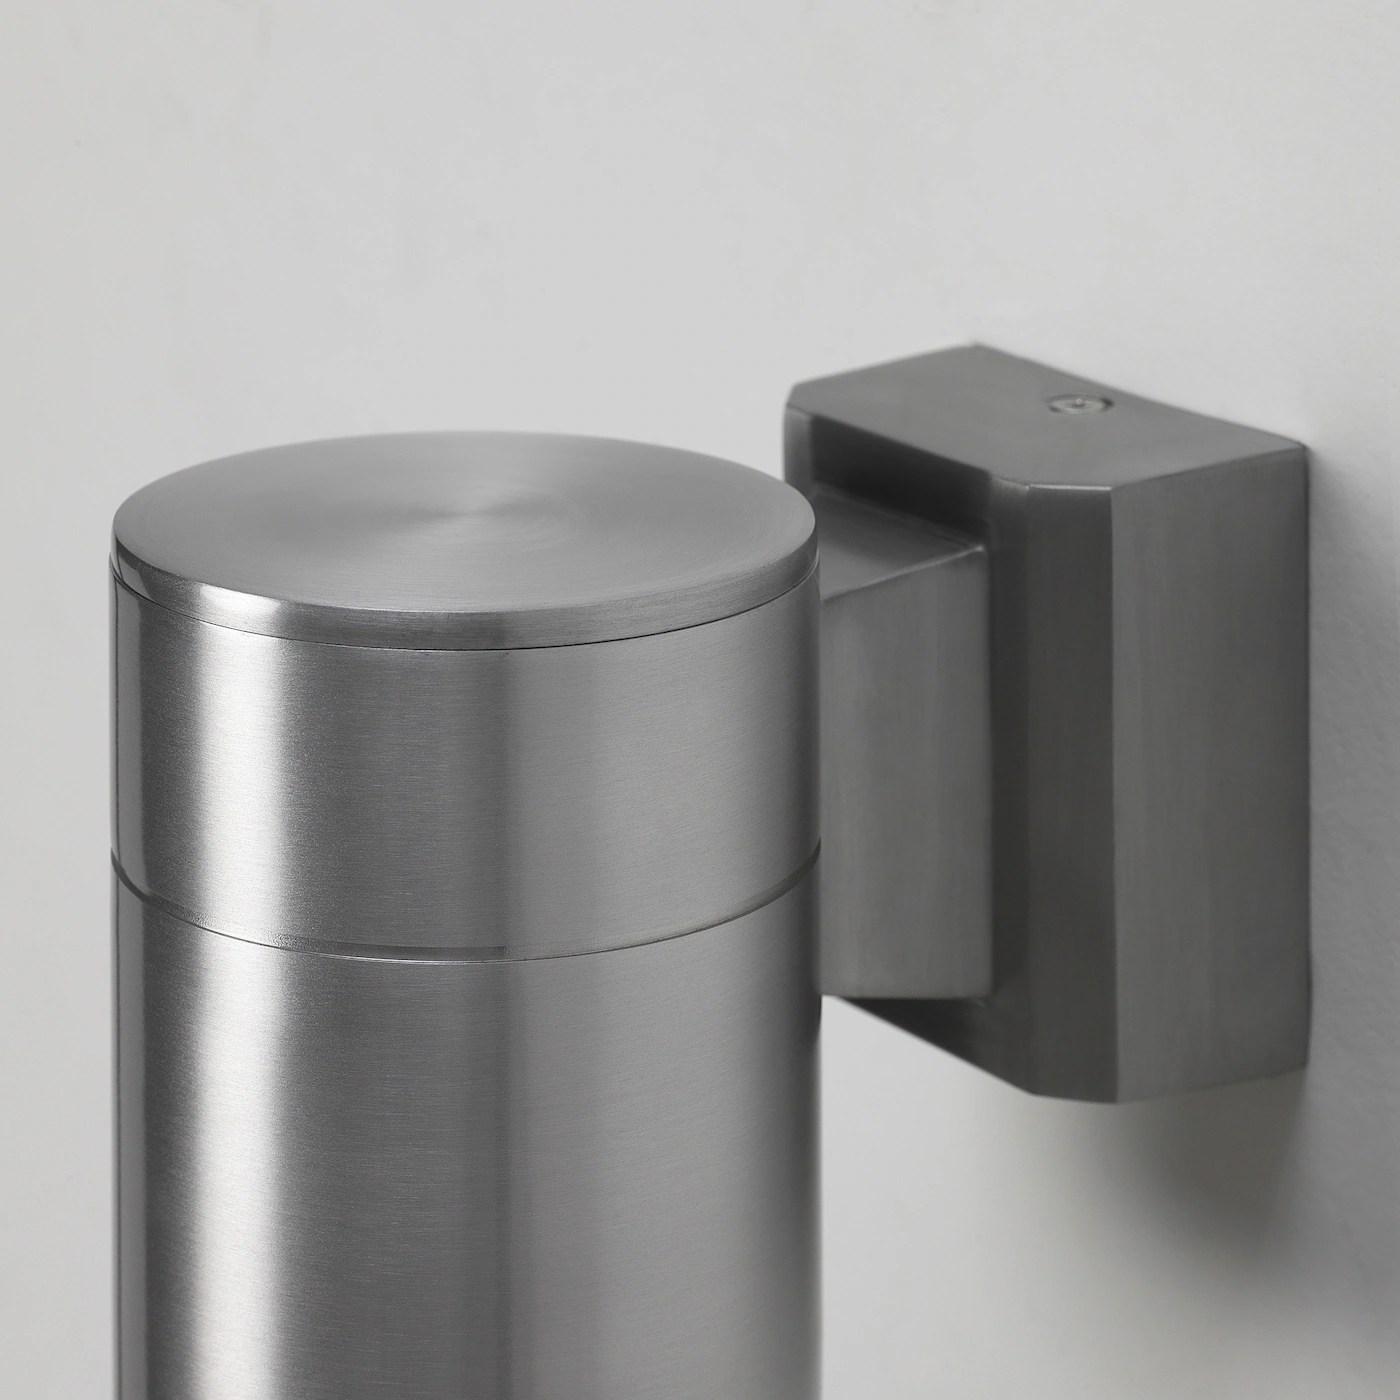 Allarp Applique Exterieur Couleur Aluminium Commandez Aujourd Hui Ikea